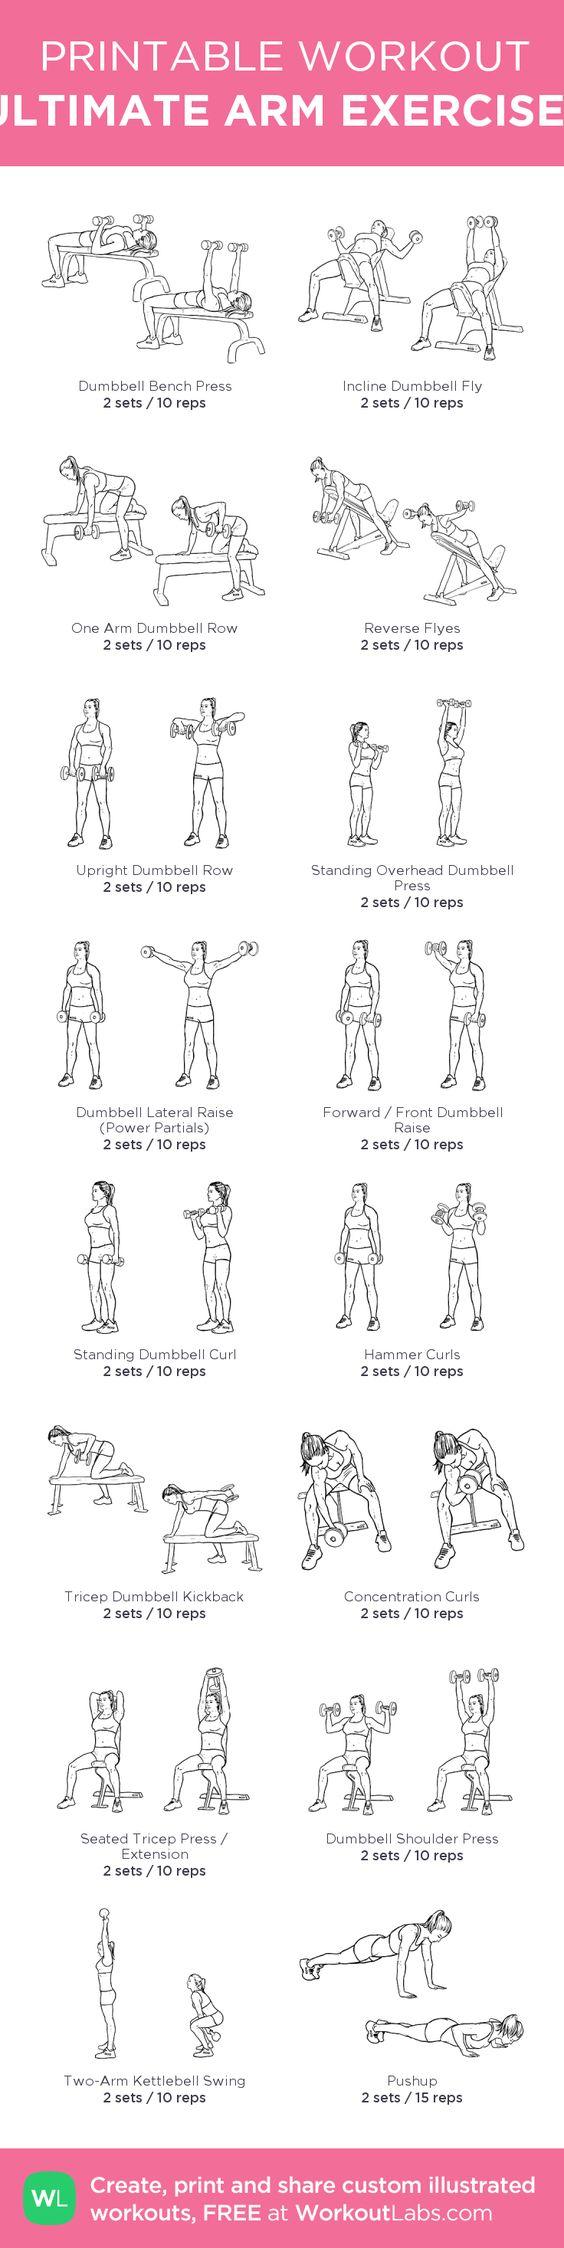 ULTIMATE ARM EXERCISES: my custom printable workout by @WorkoutLabs #workoutlabs #customworkout